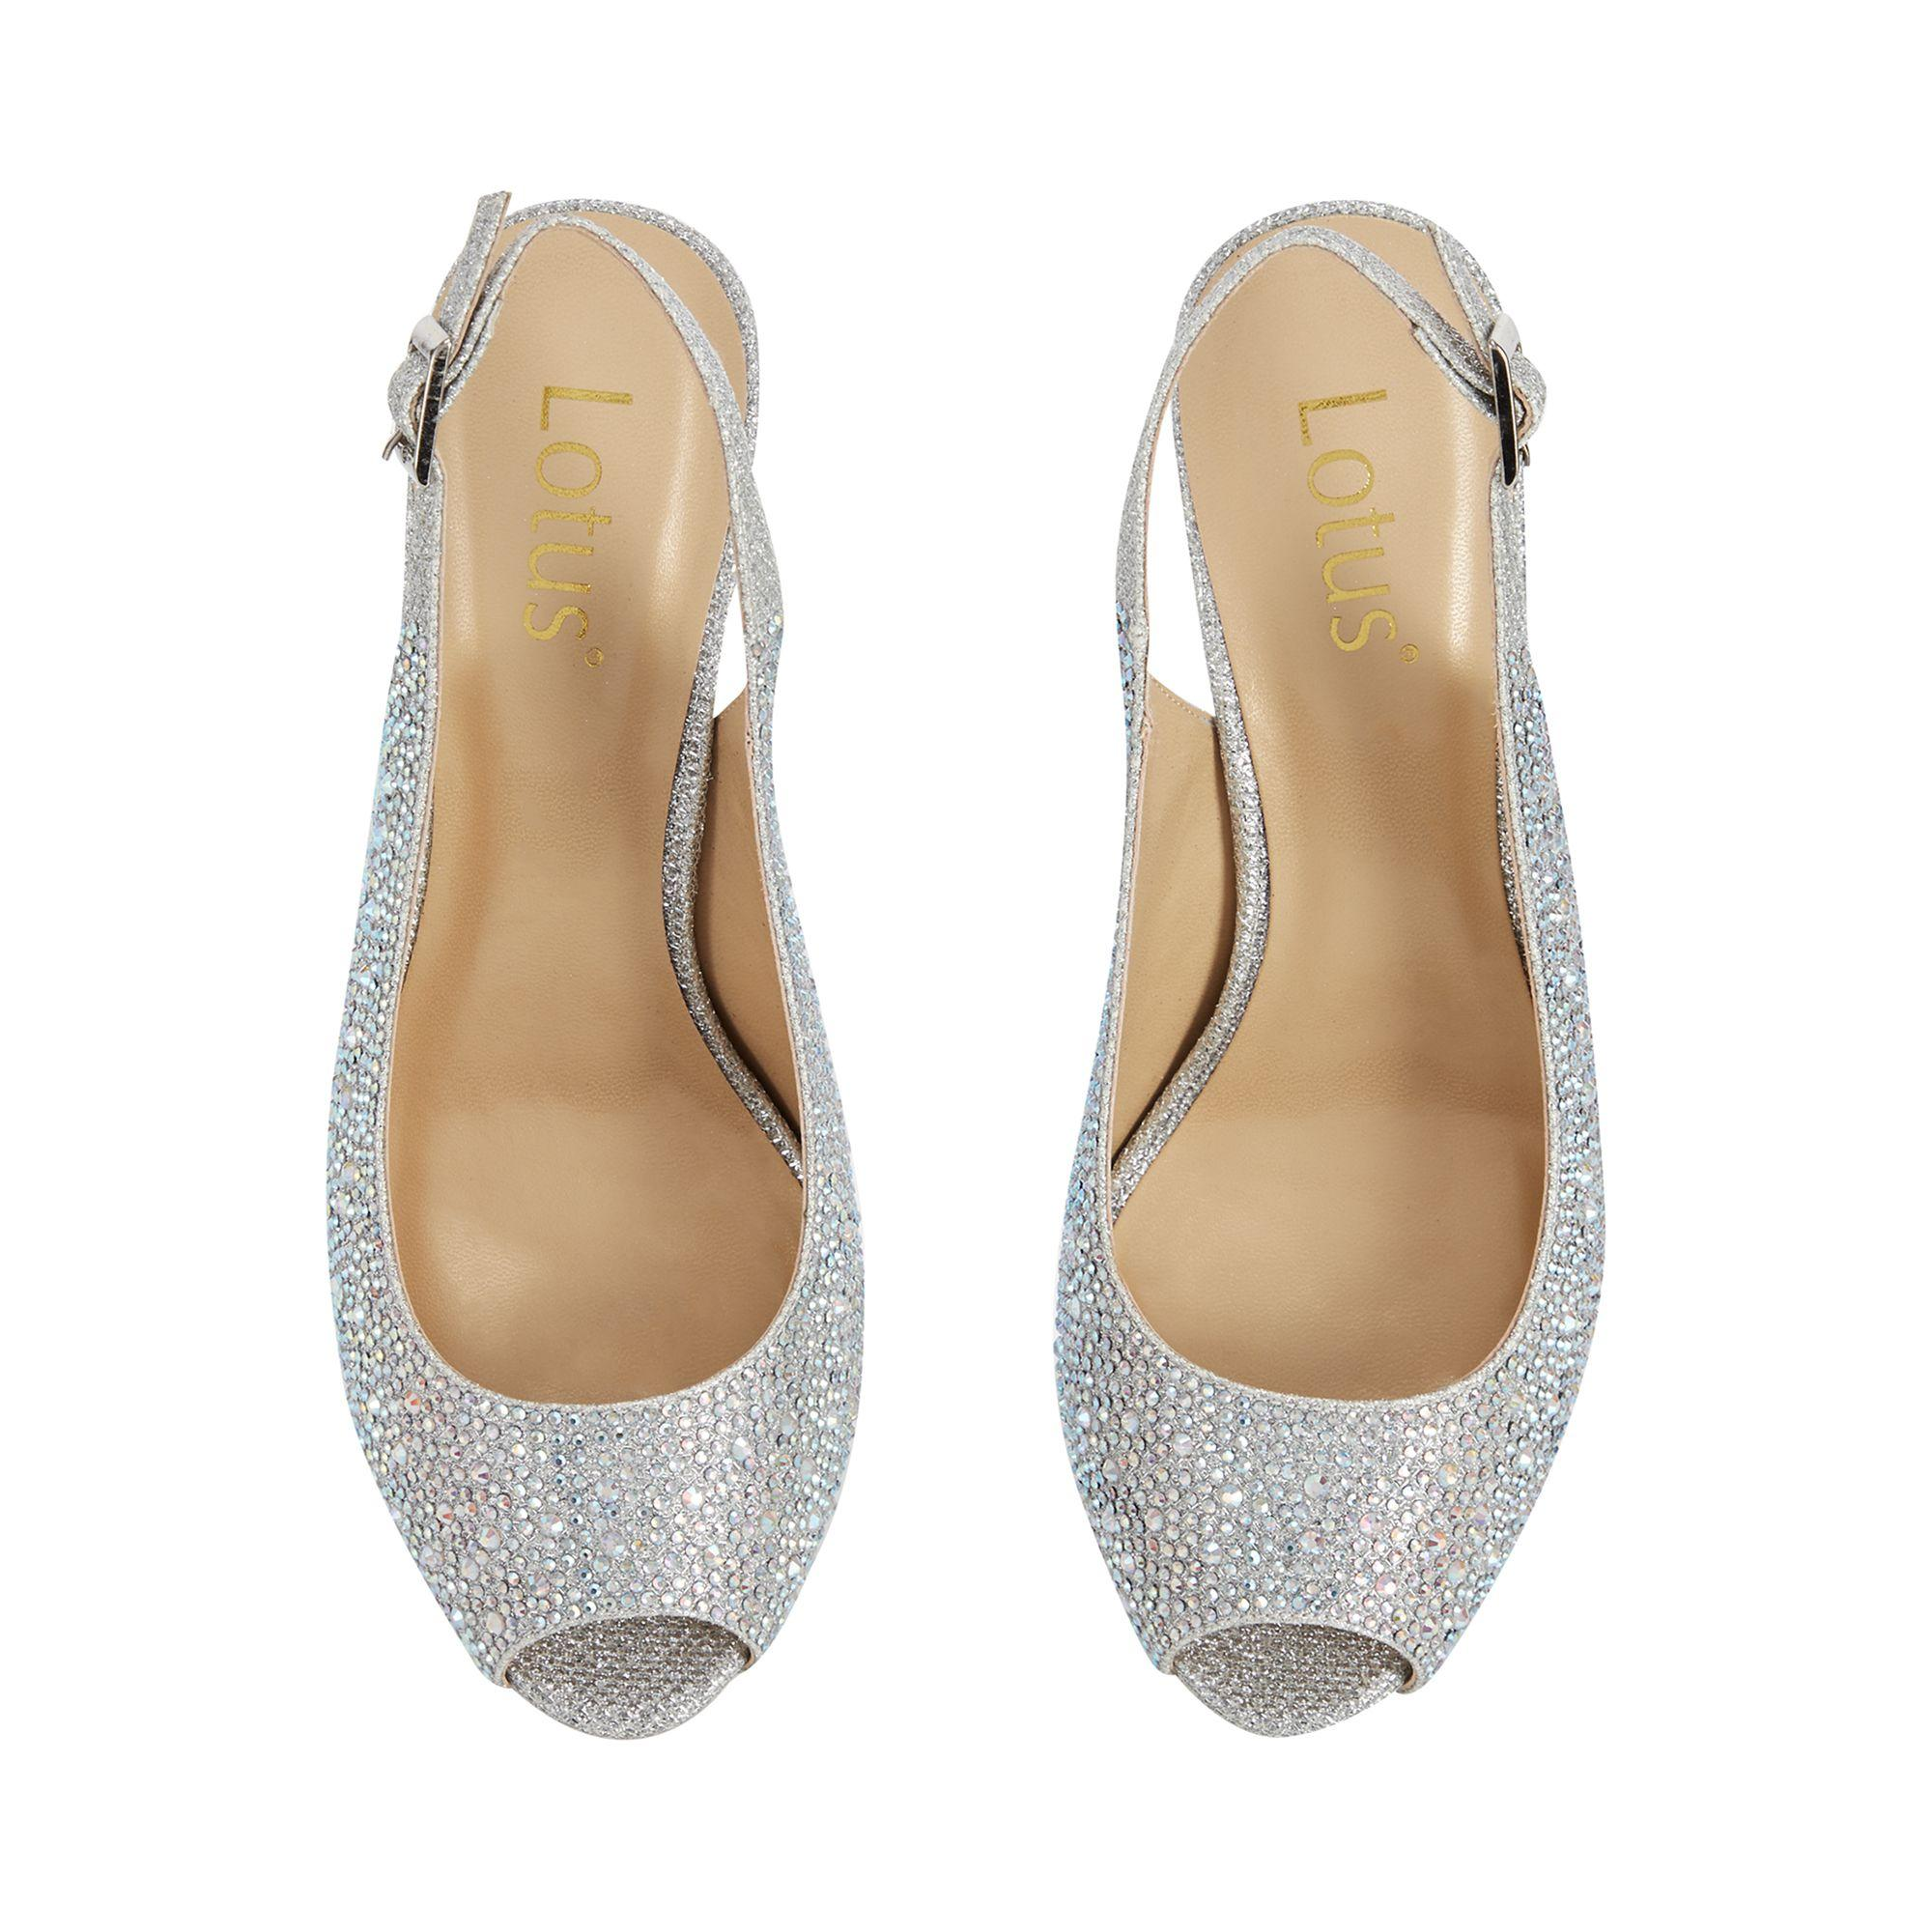 992d160fc86 Women's Metallic Diamante 'astro' High Stiletto Heel Slingbacks